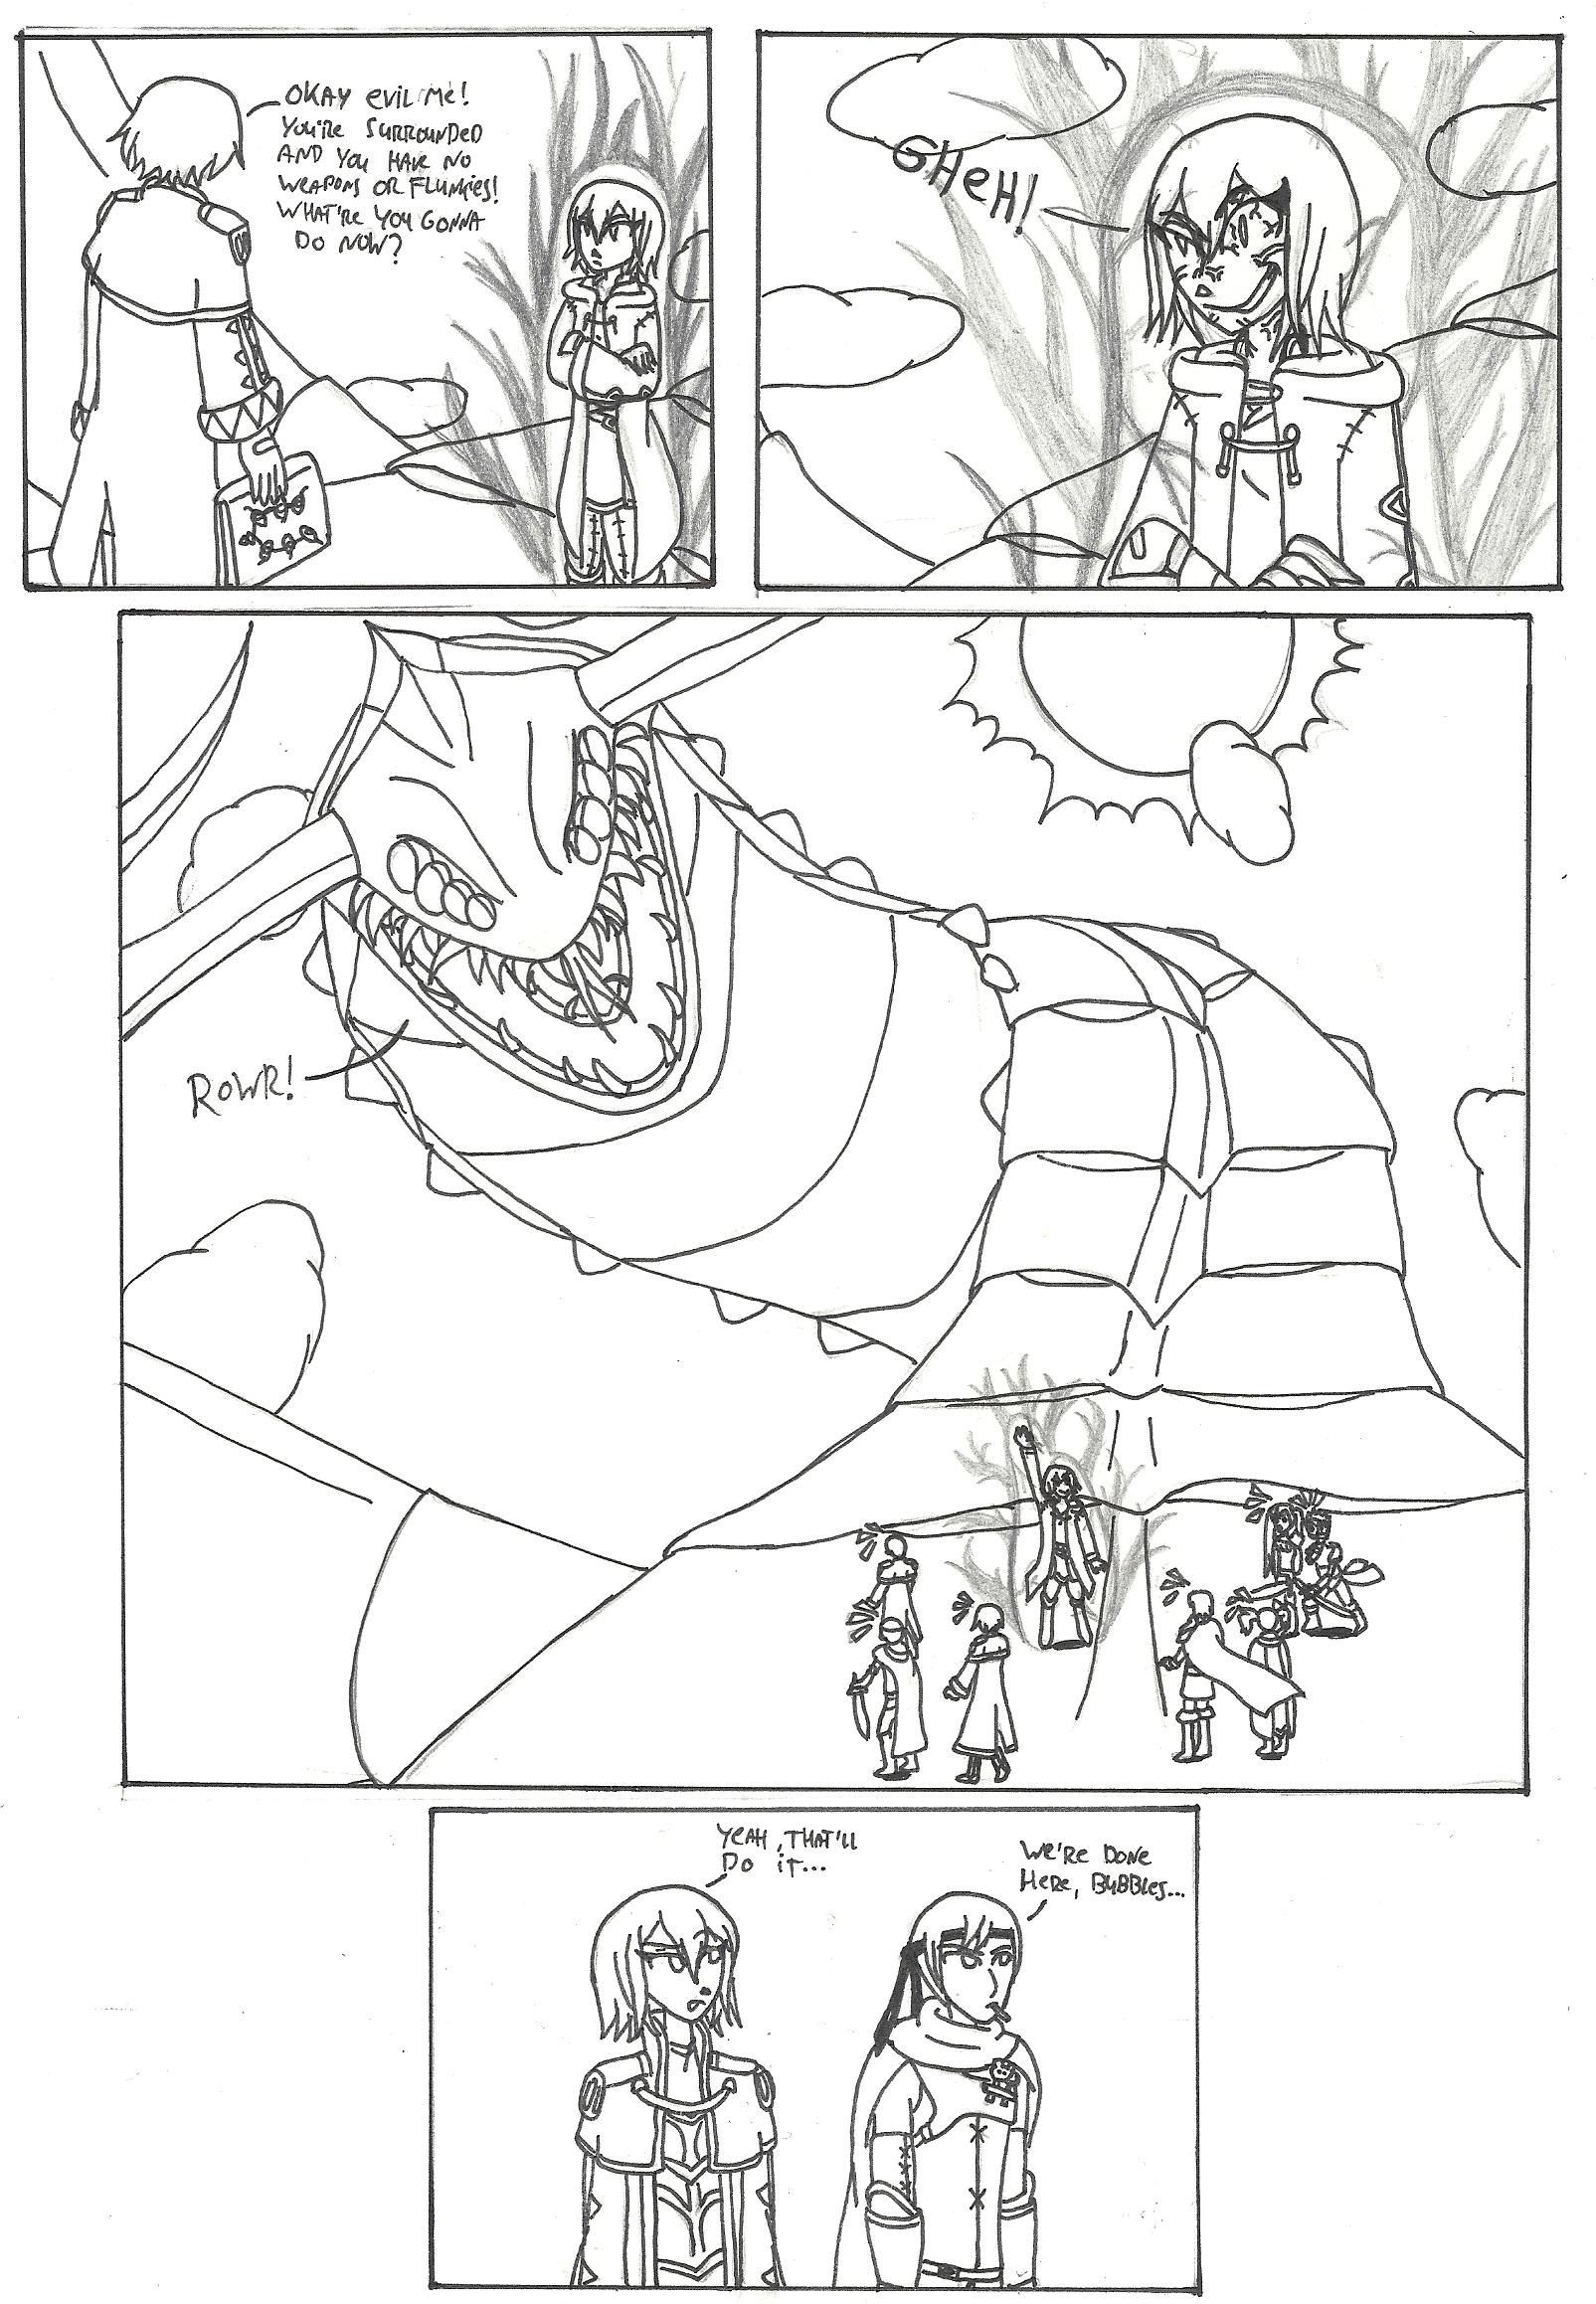 FireEmblem Awakening Final chapter (MAJOR spoiler) by misterj02